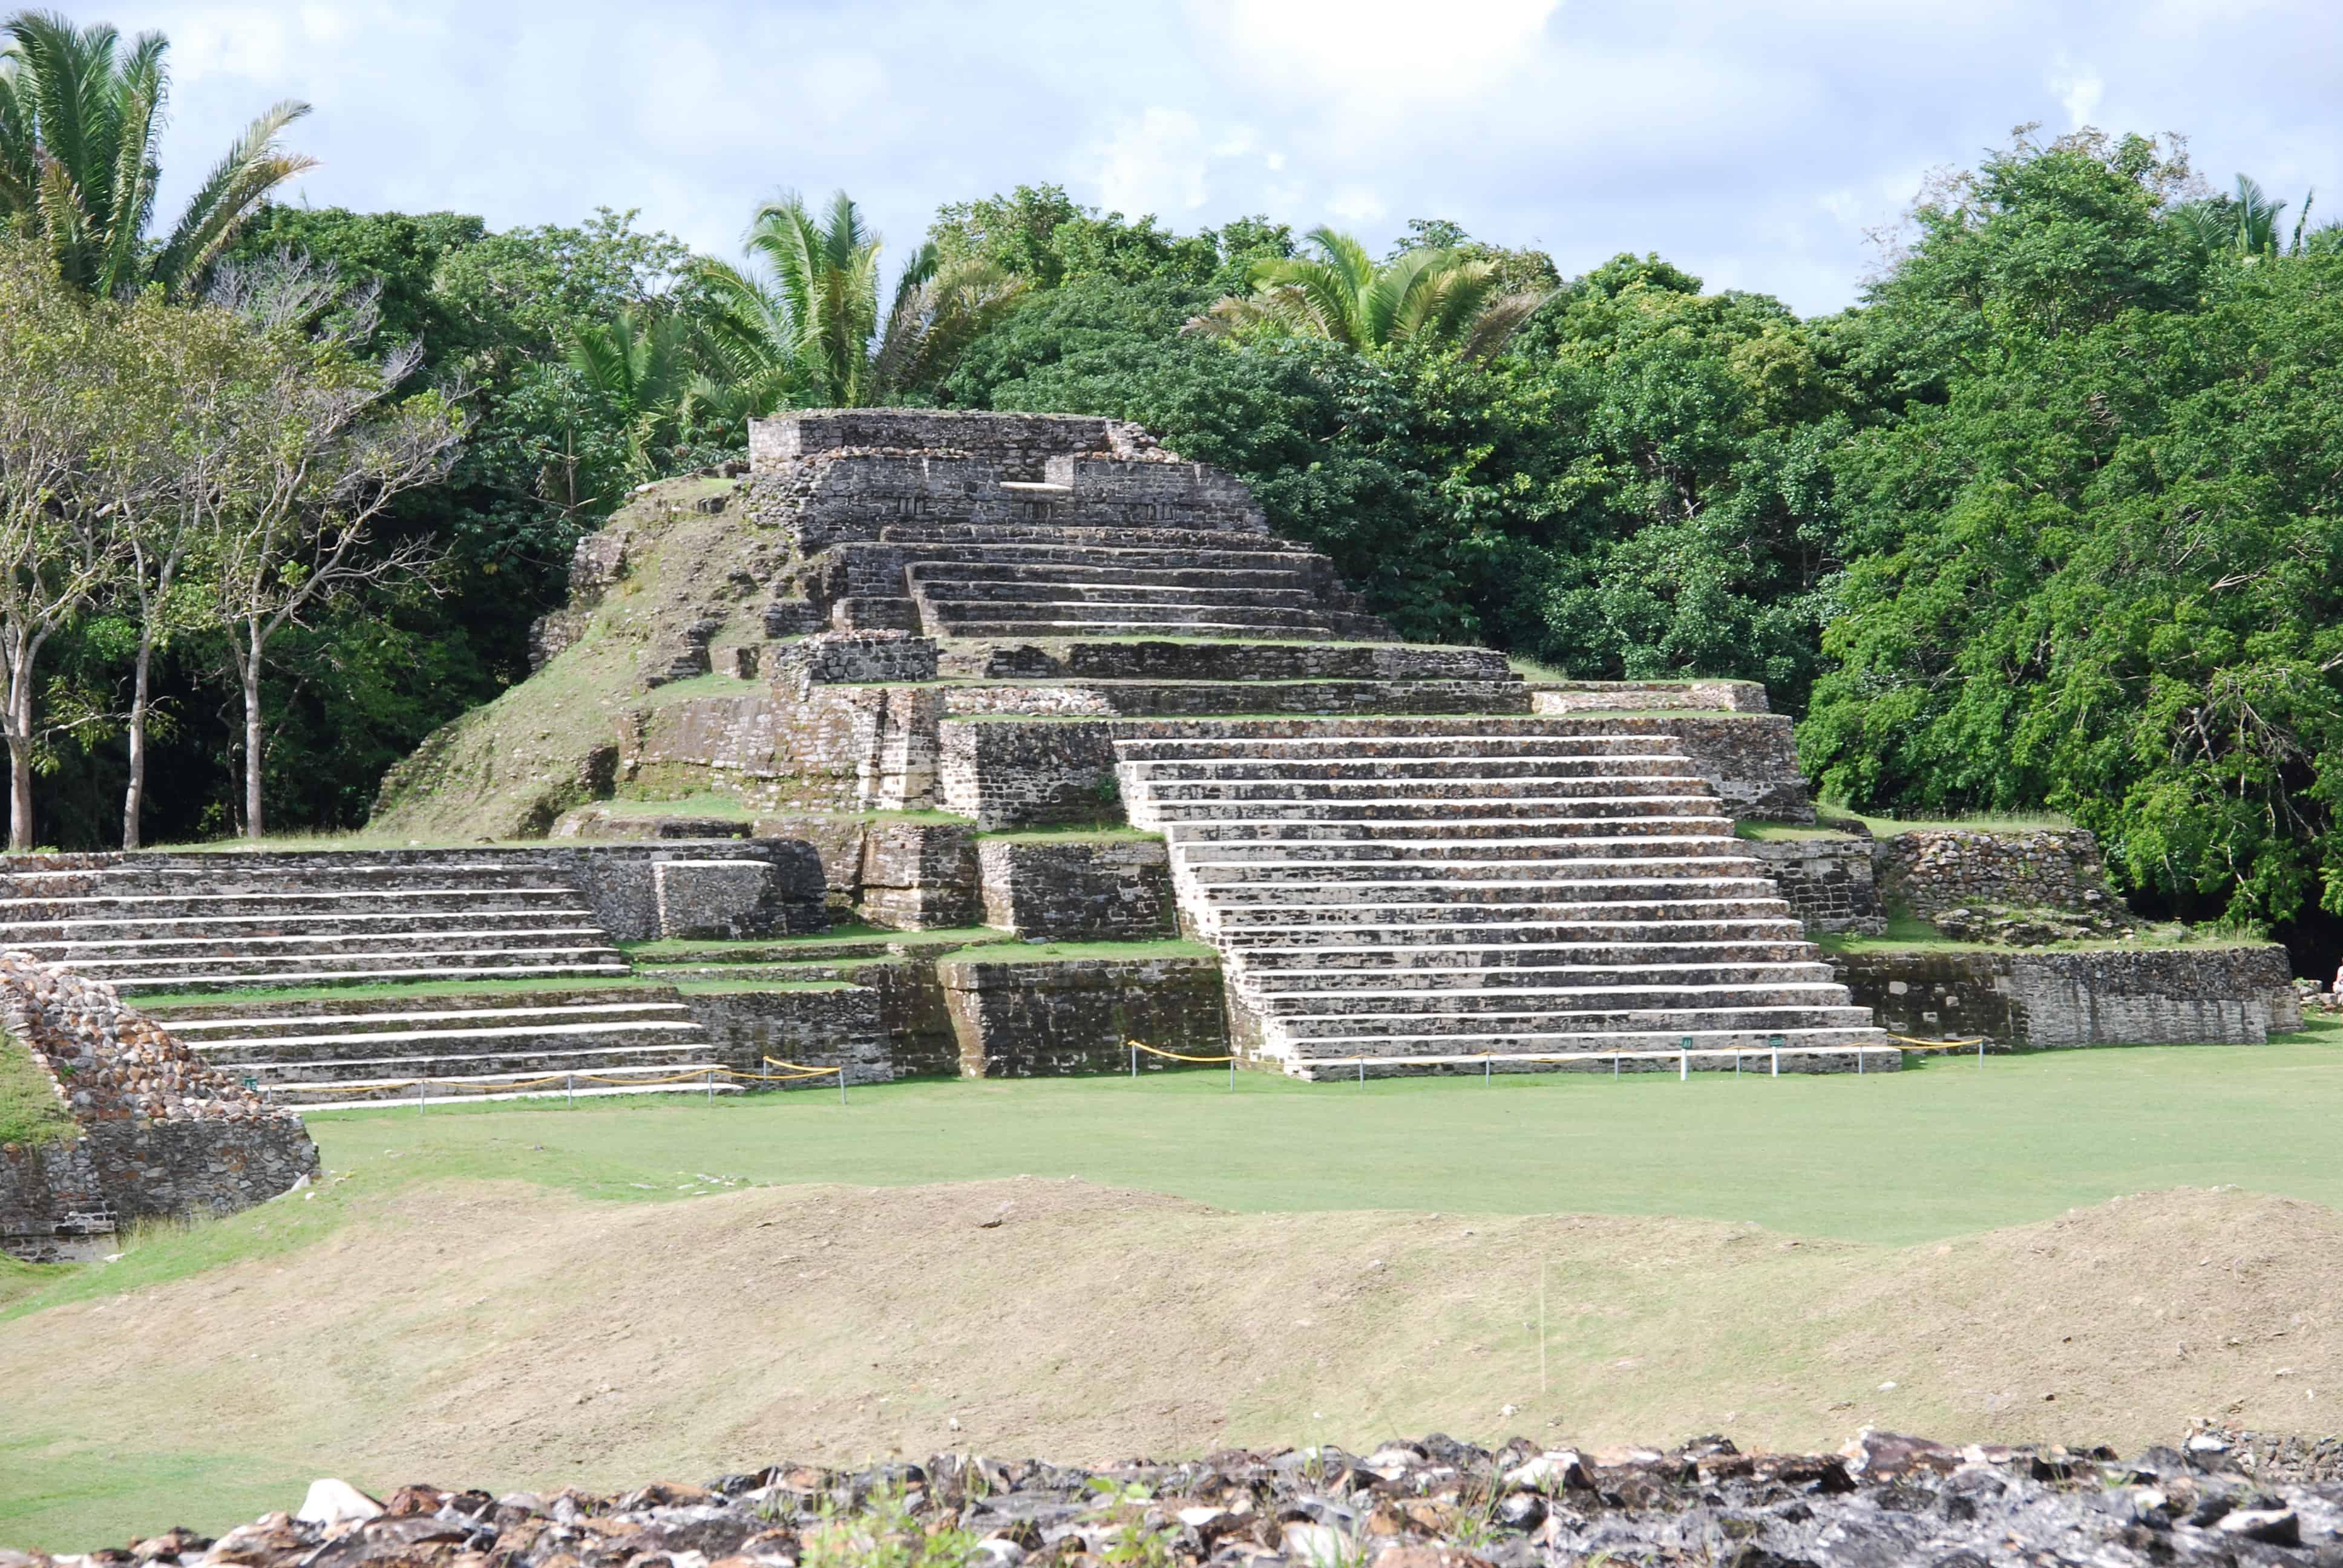 00 Maya Tempelanlage Altun Ha Belize